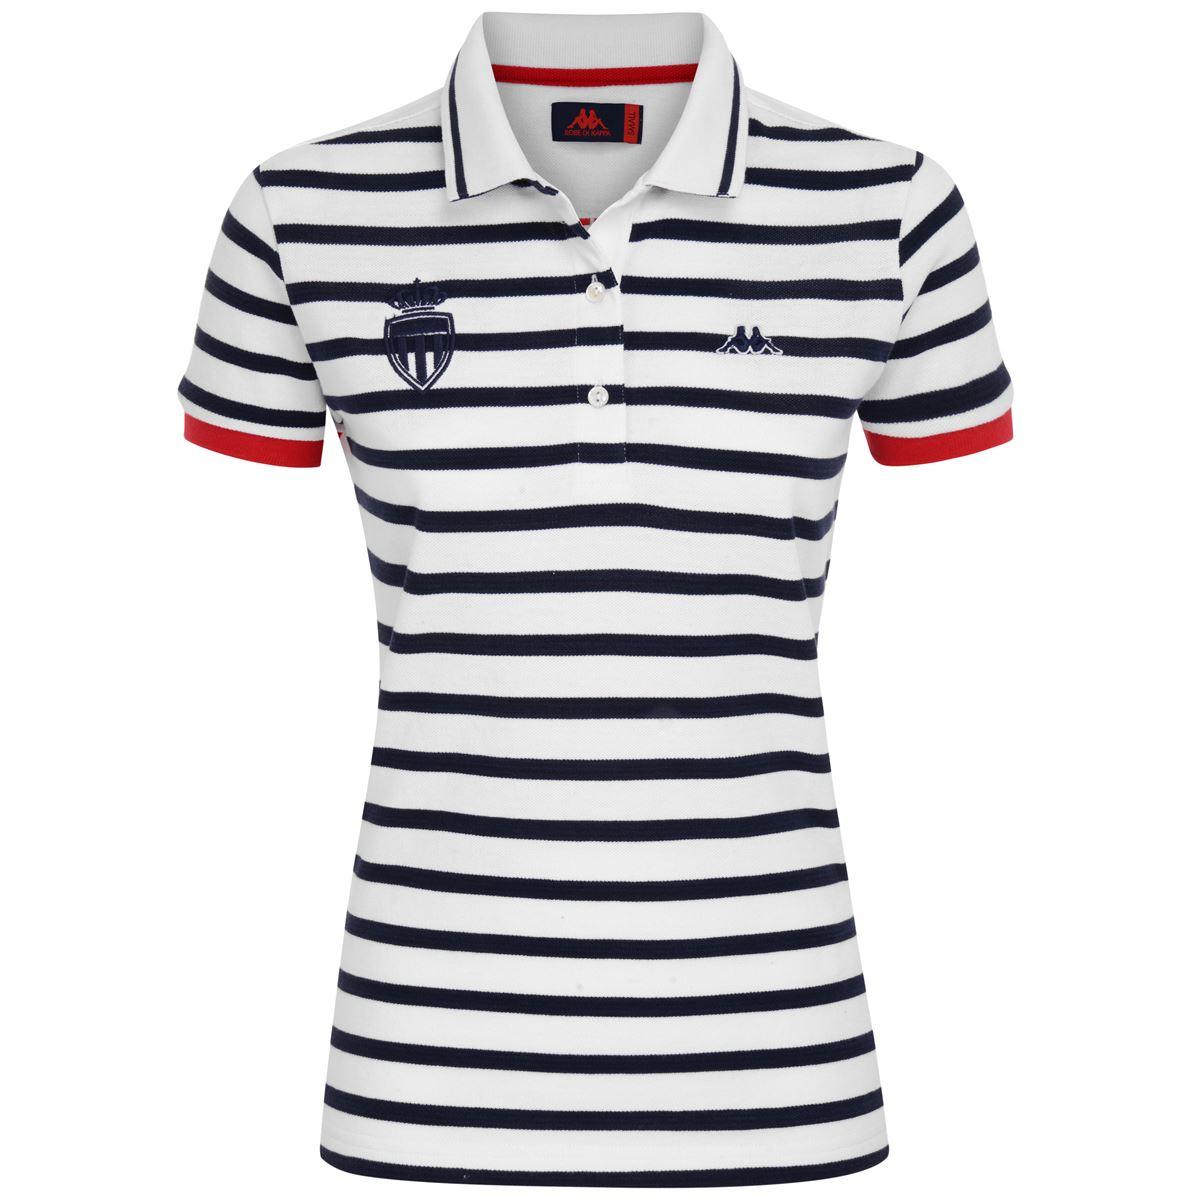 Robe di Kappa Polo Shirts donna-61114SW